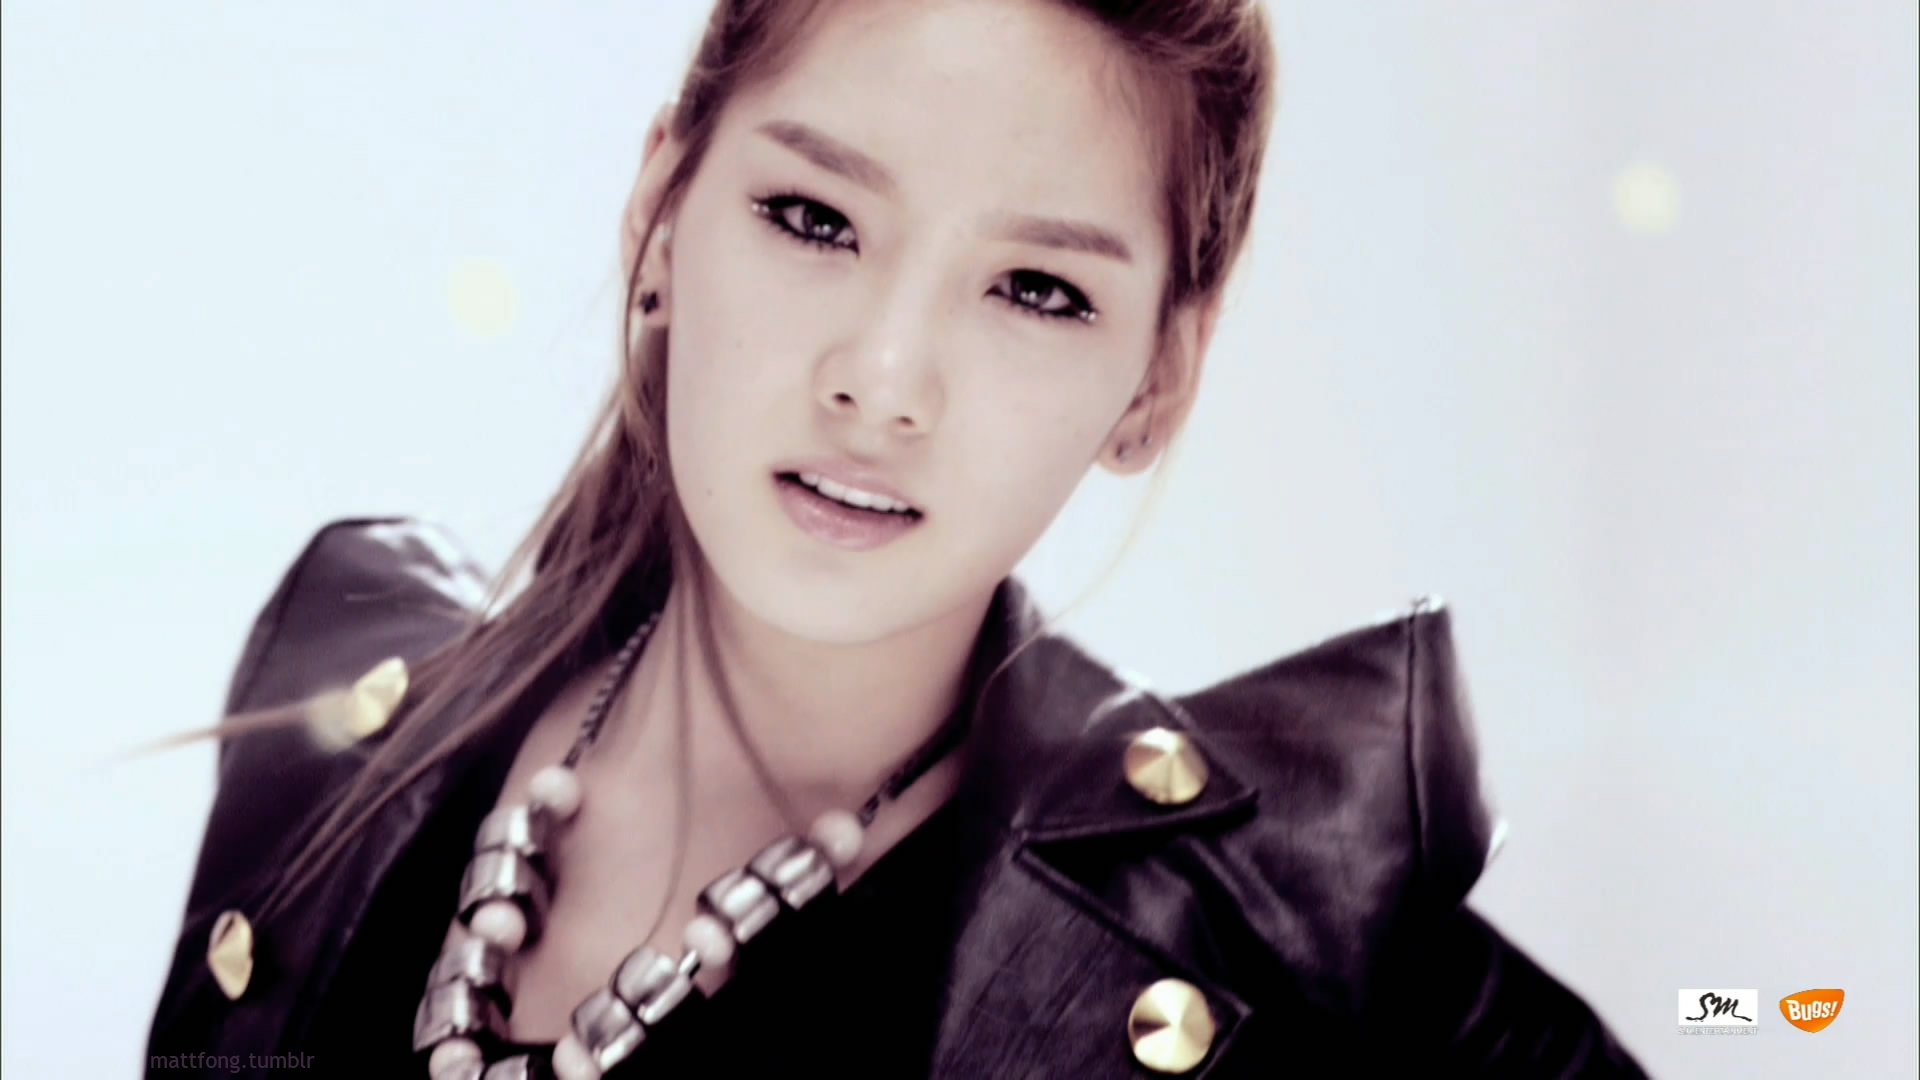 Girls Generation Tiffany Wallpaper Girls Generation Snsd Kim Taeyeon Wallpaper 1920x1080